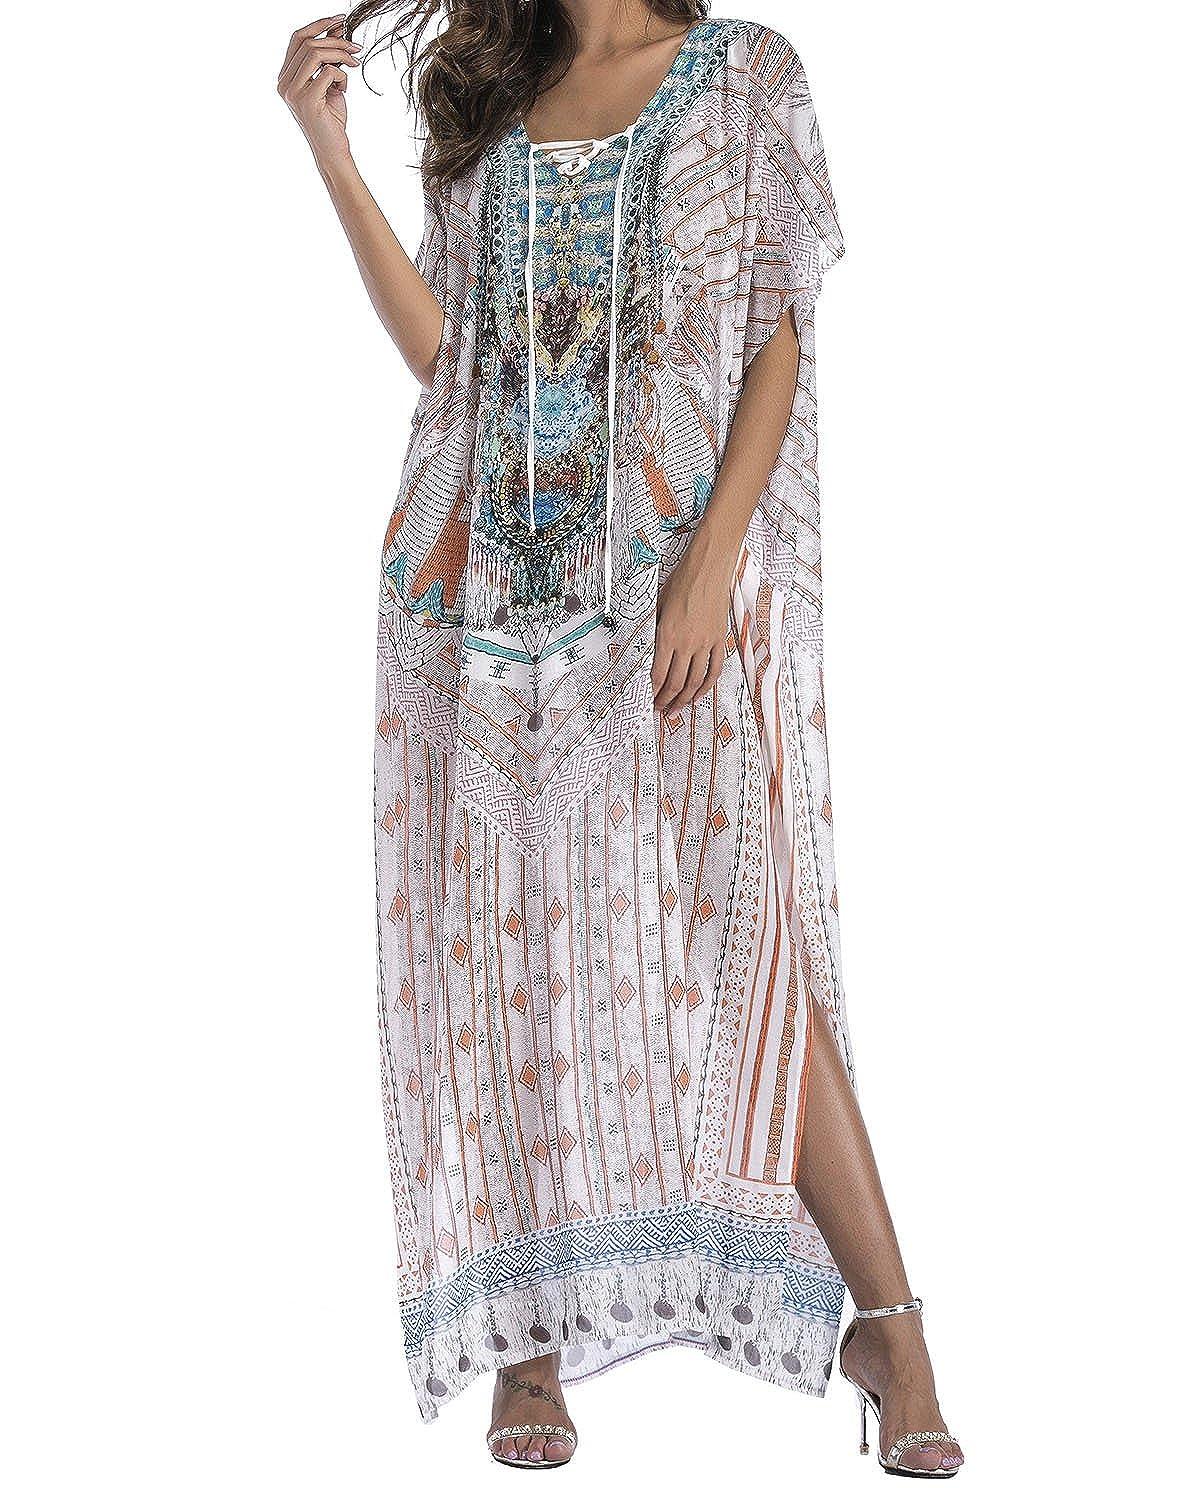 Style1 Flowy Rhinestone Long Caftan Beach Maxi Dress Sexy Cover Up For Women